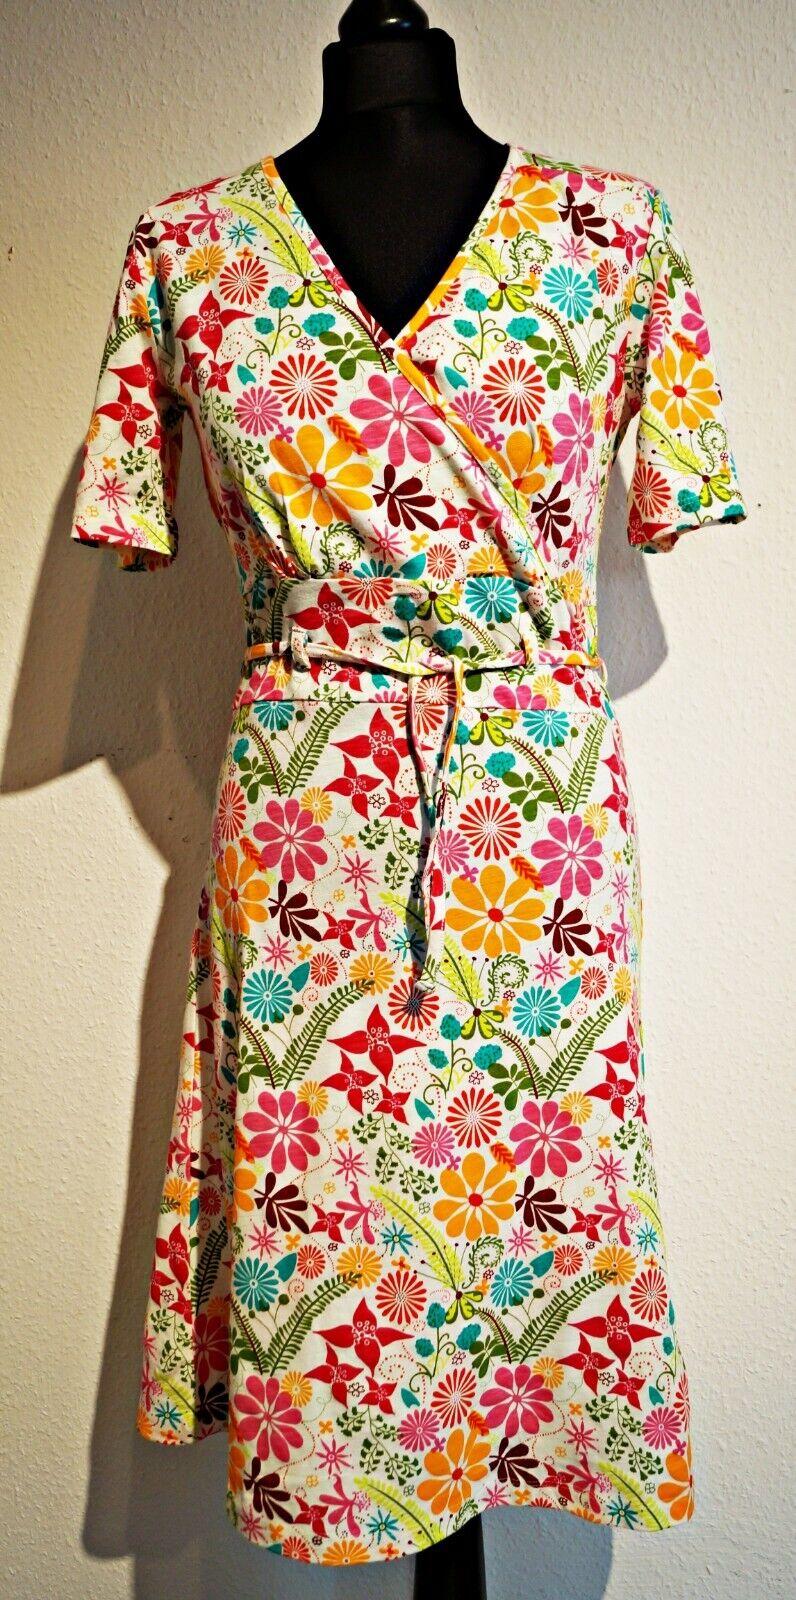 H212 Himalaya Dress Bio Cotton Cotton Cotton Jersey Fairtrade Summer Wraparound Look a75e55